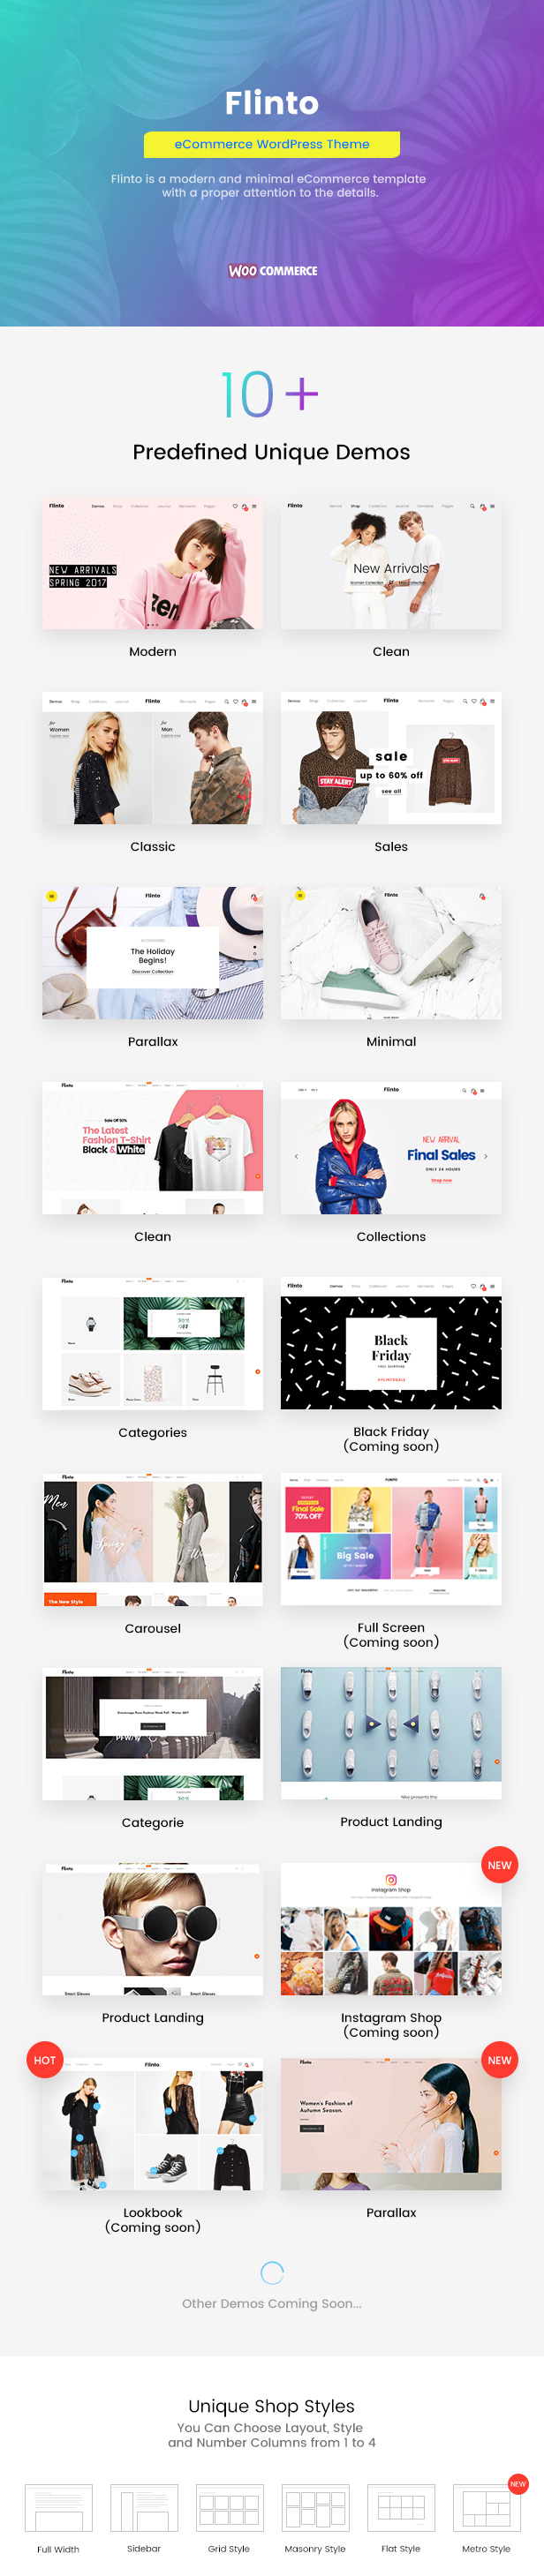 Flinto – Modern and Minimal eCommerce WordPress Theme - 1